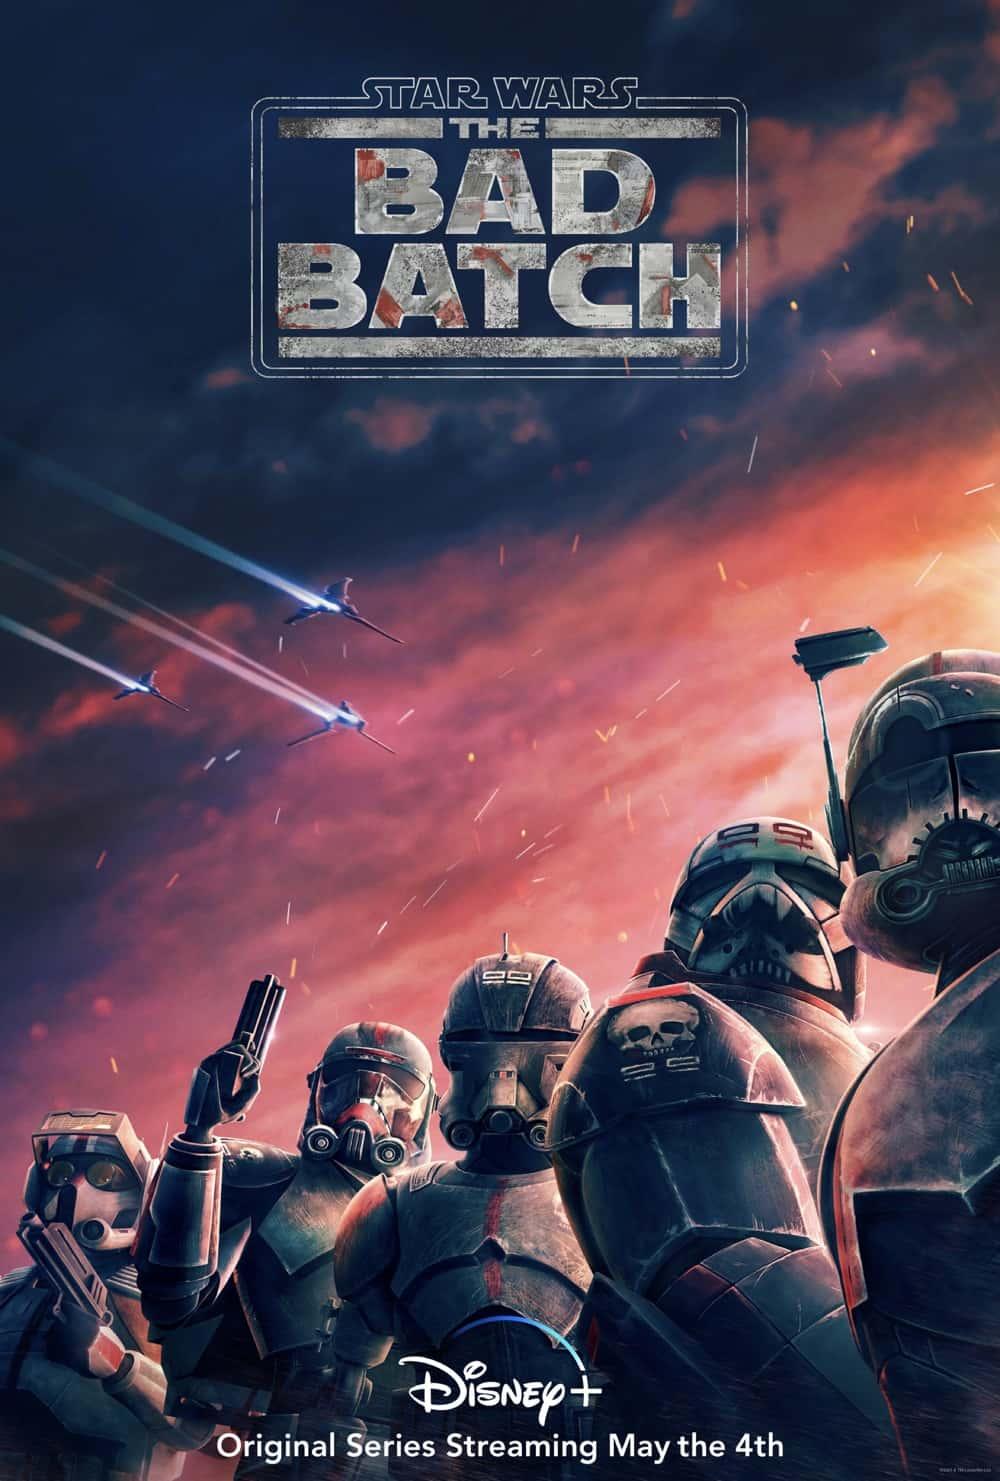 STAR WARS THE BAD BATCH Poster Key Art